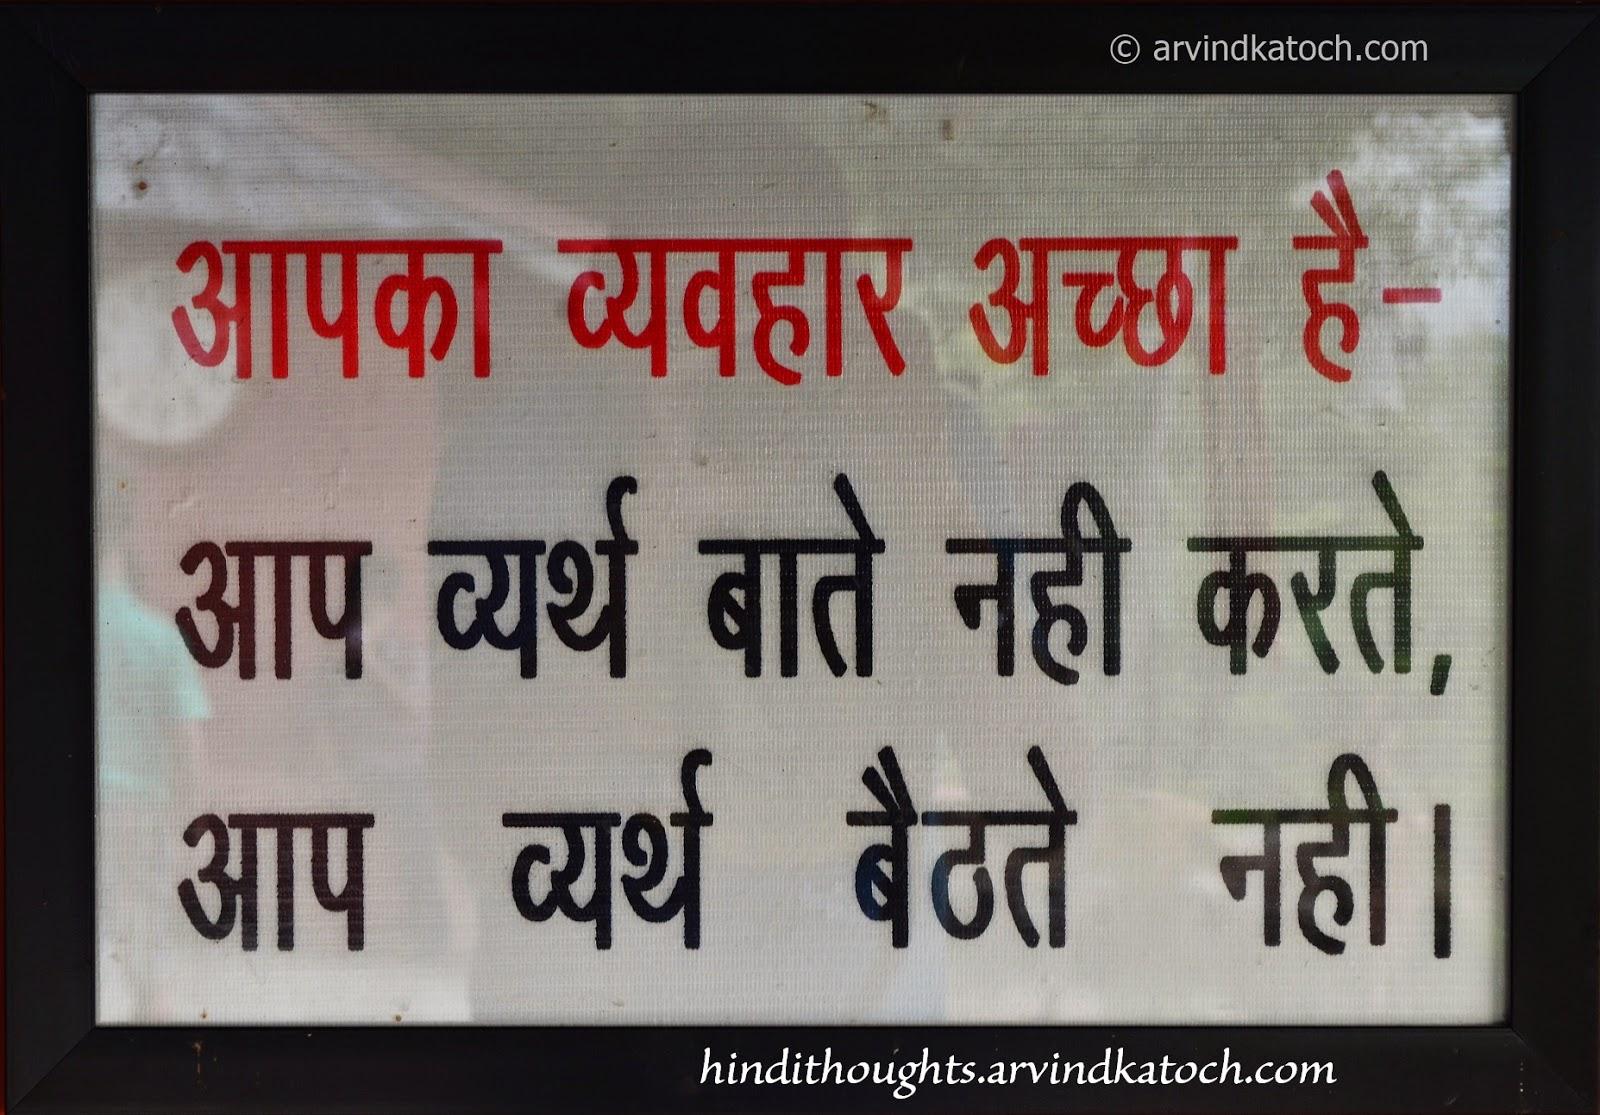 Behaviour, Idle, Vain, Hindi thought, Quote, Hindi